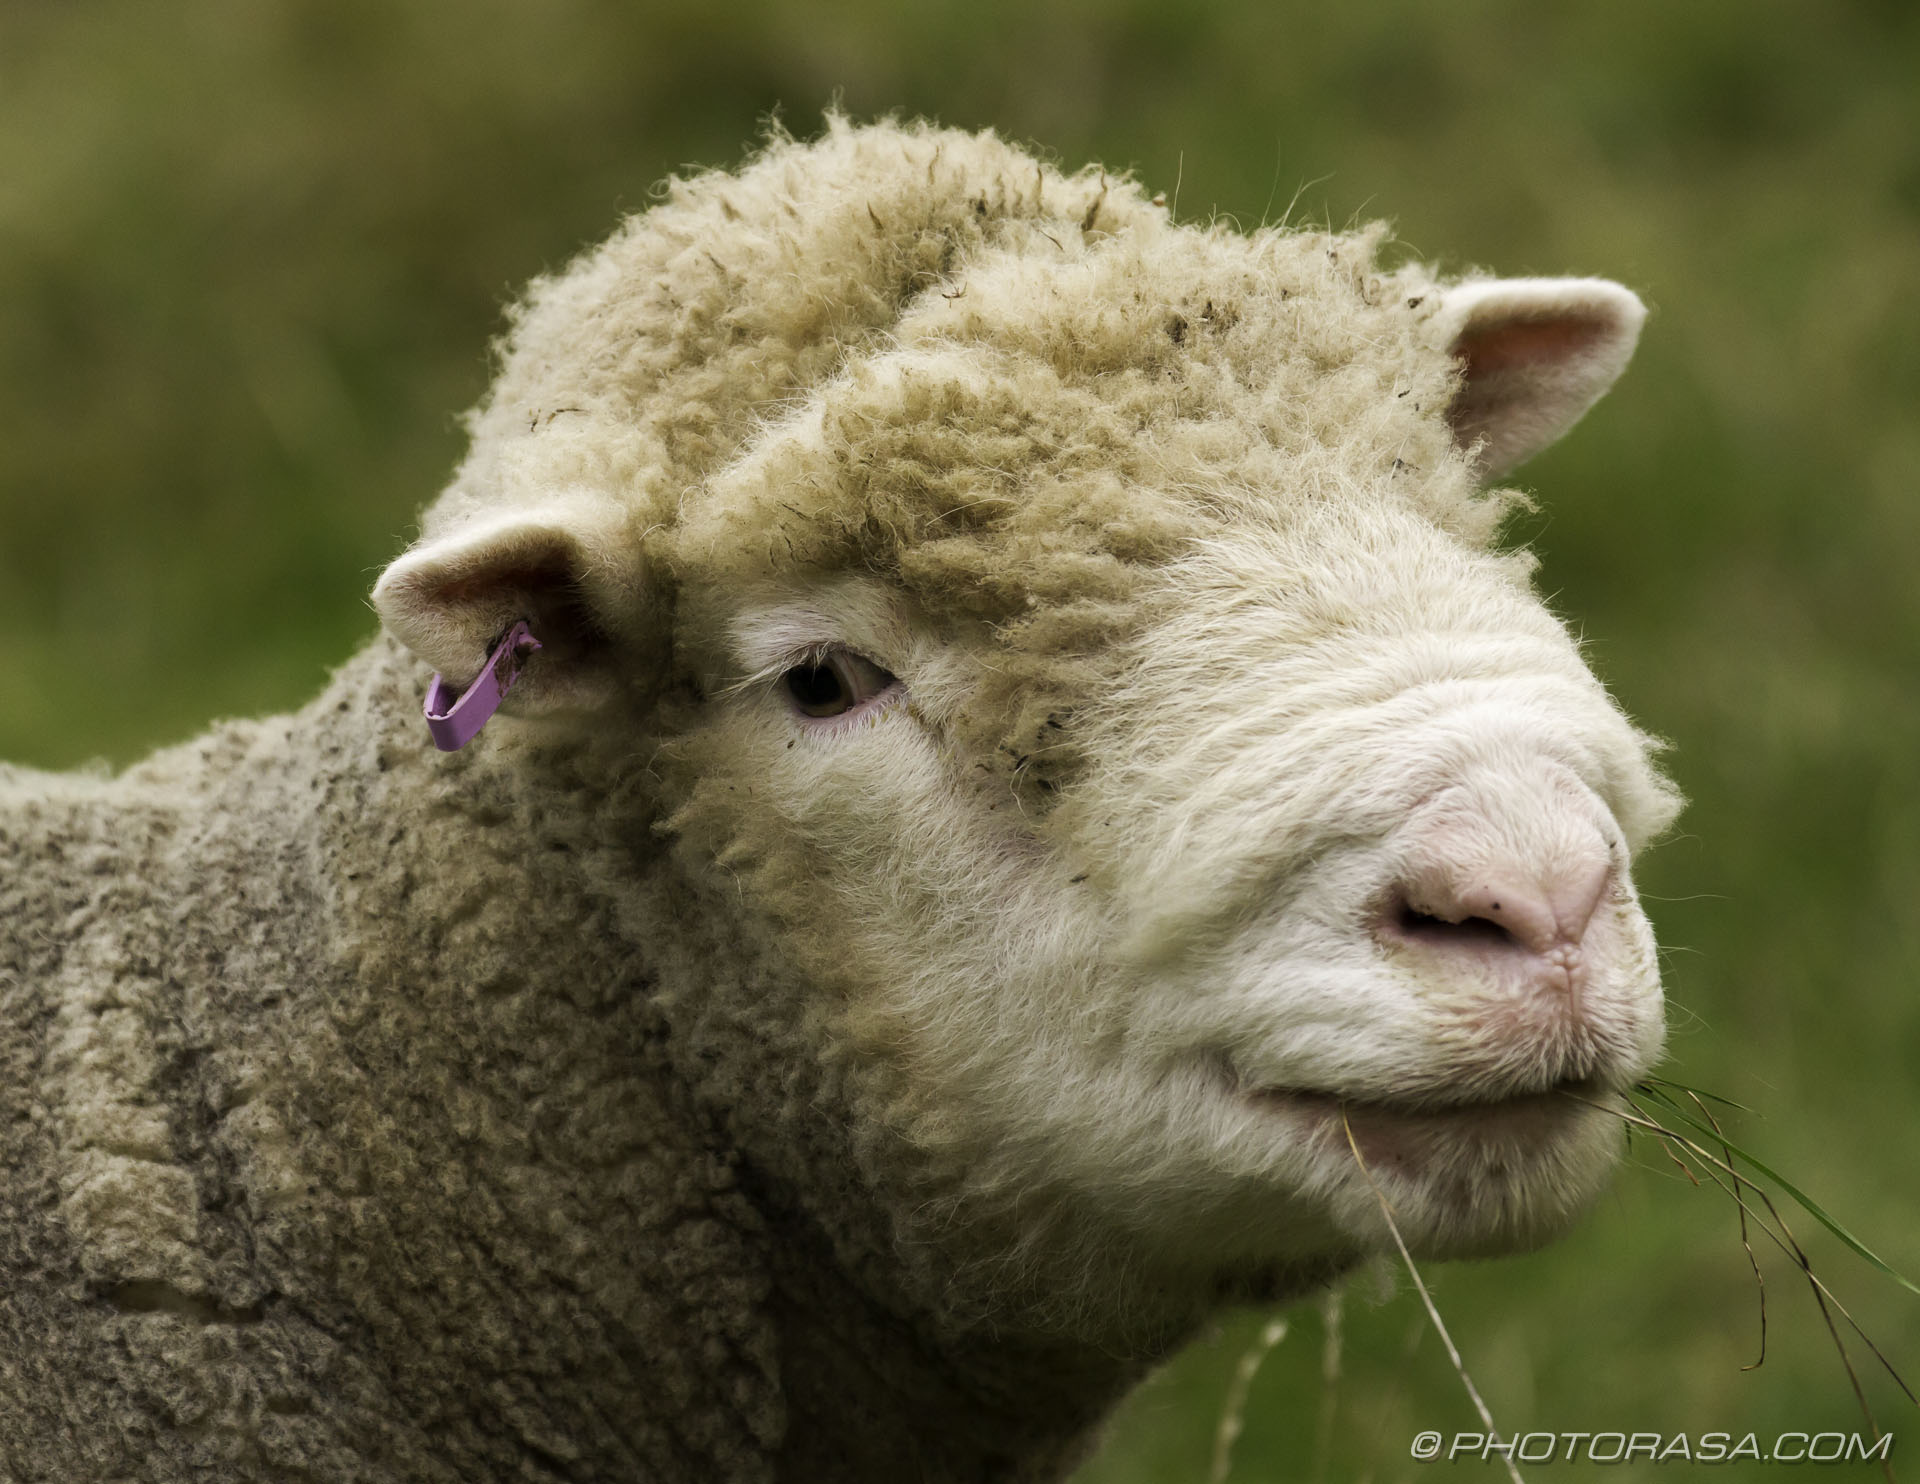 http://photorasa.com/sheep/rambouillet-ewe-head-close-up/